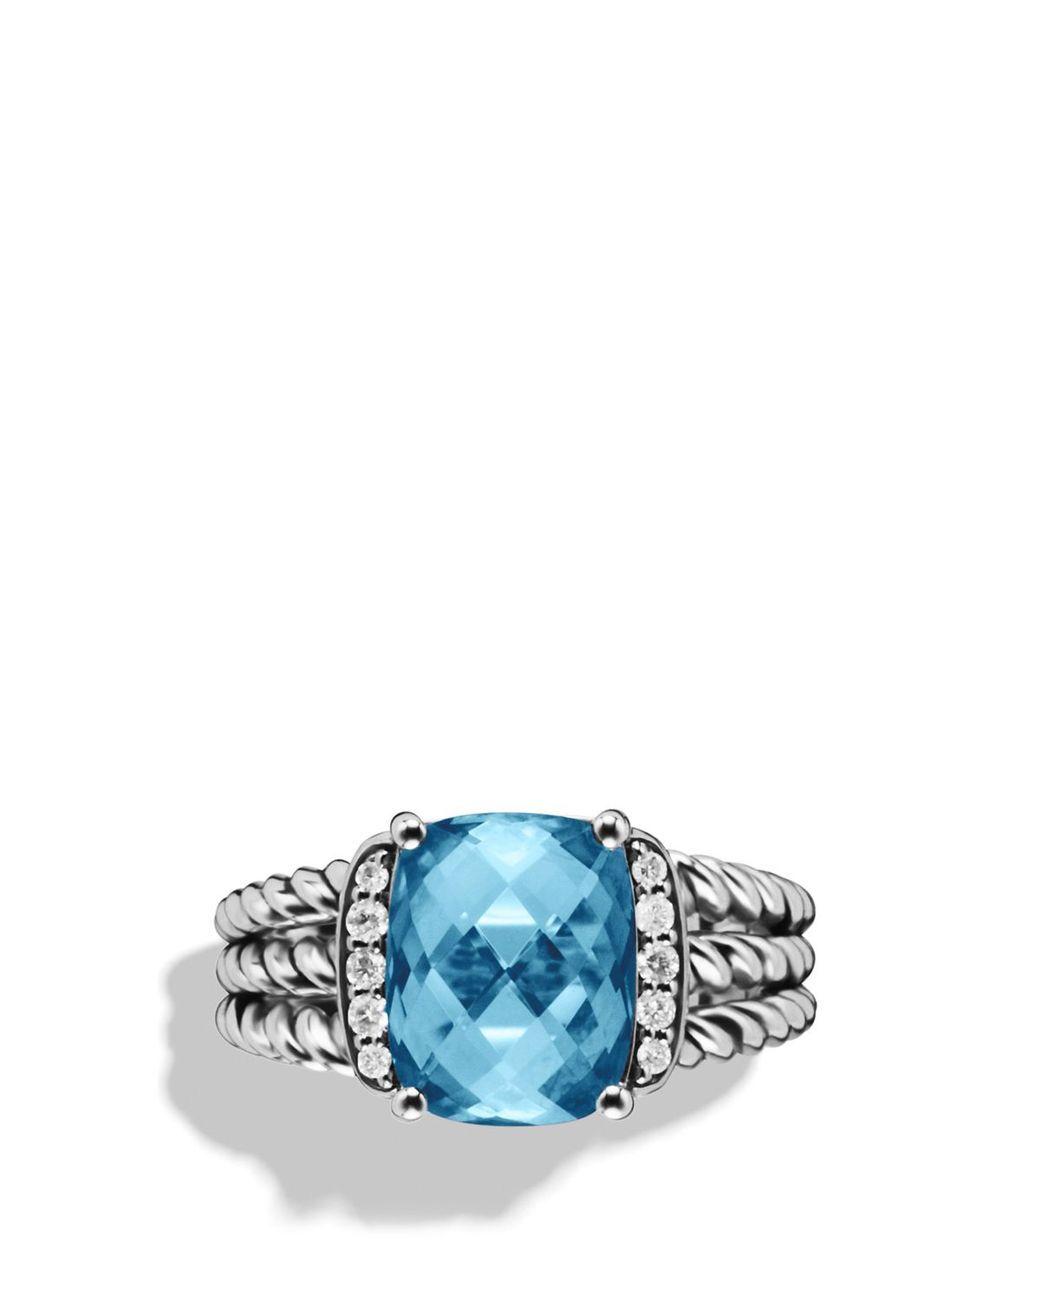 7c7085ebf7f1b Women's Petite Wheaton Ring With Hampton Blue Topaz And Diamonds ...